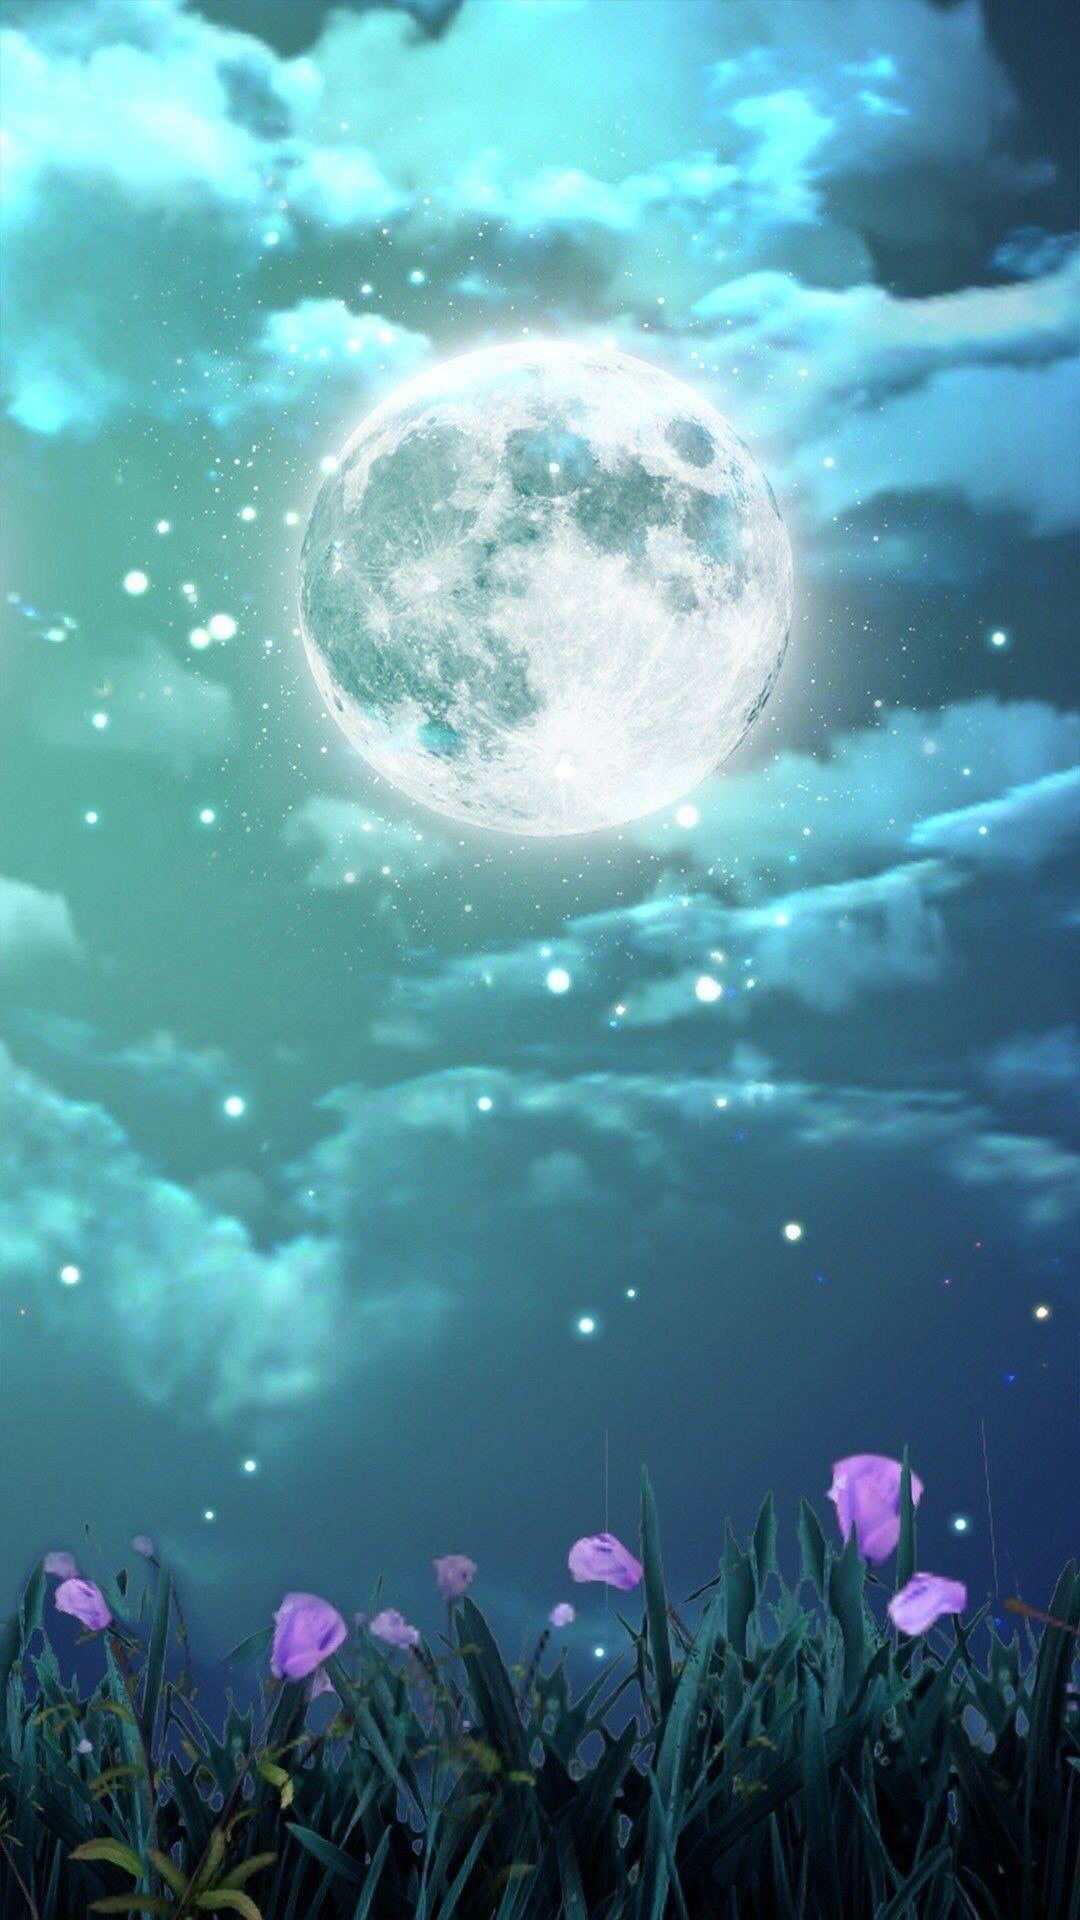 Pin By Meredith Seidl On Moon Stars Sun In Art Fantasy